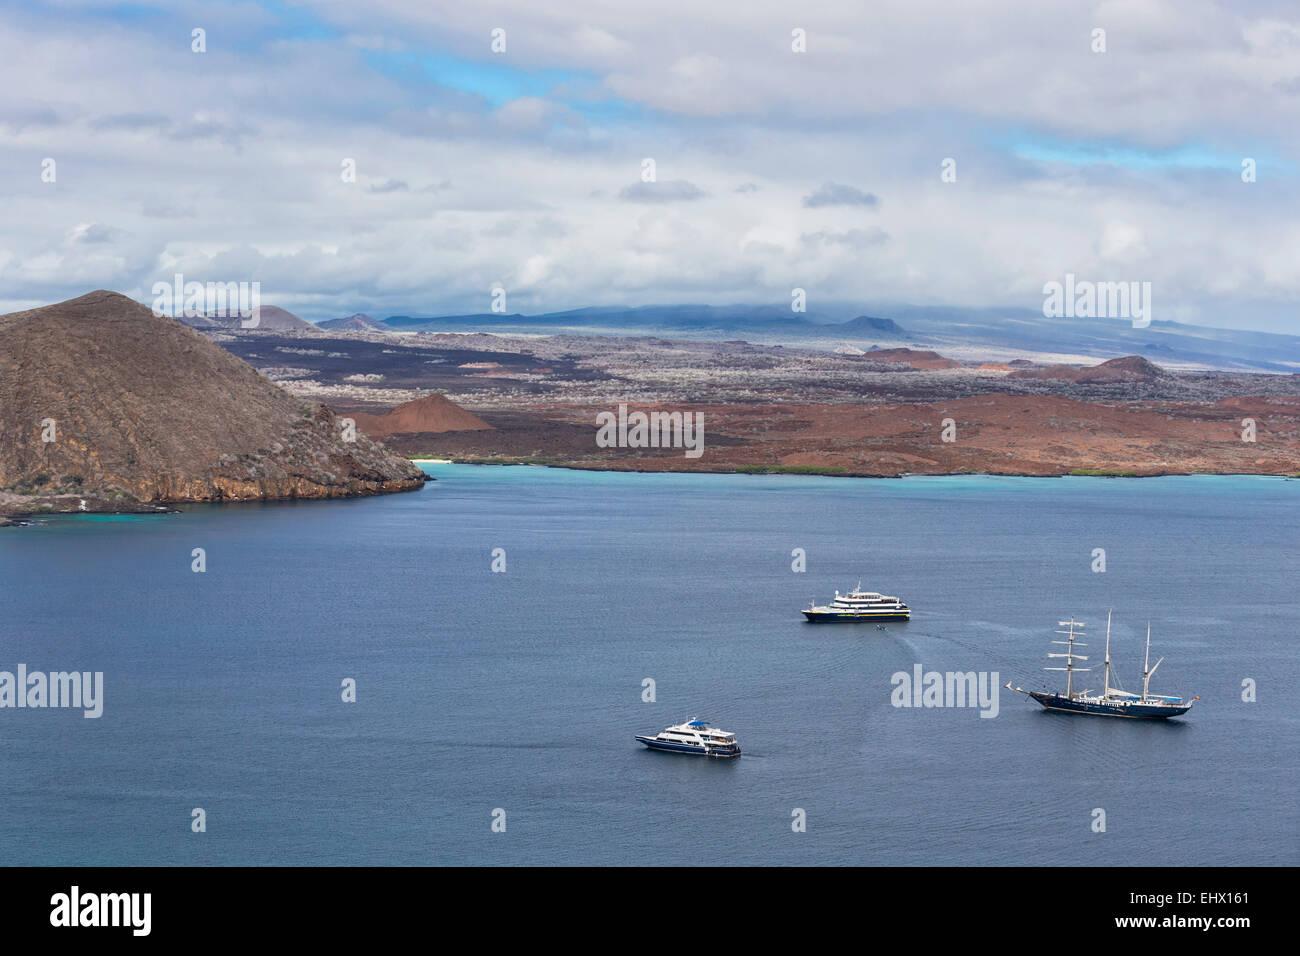 Pacific Ocean, sailing ship and cruise ships in bay of Bartolome Island, Galapagos Islands - Stock Image